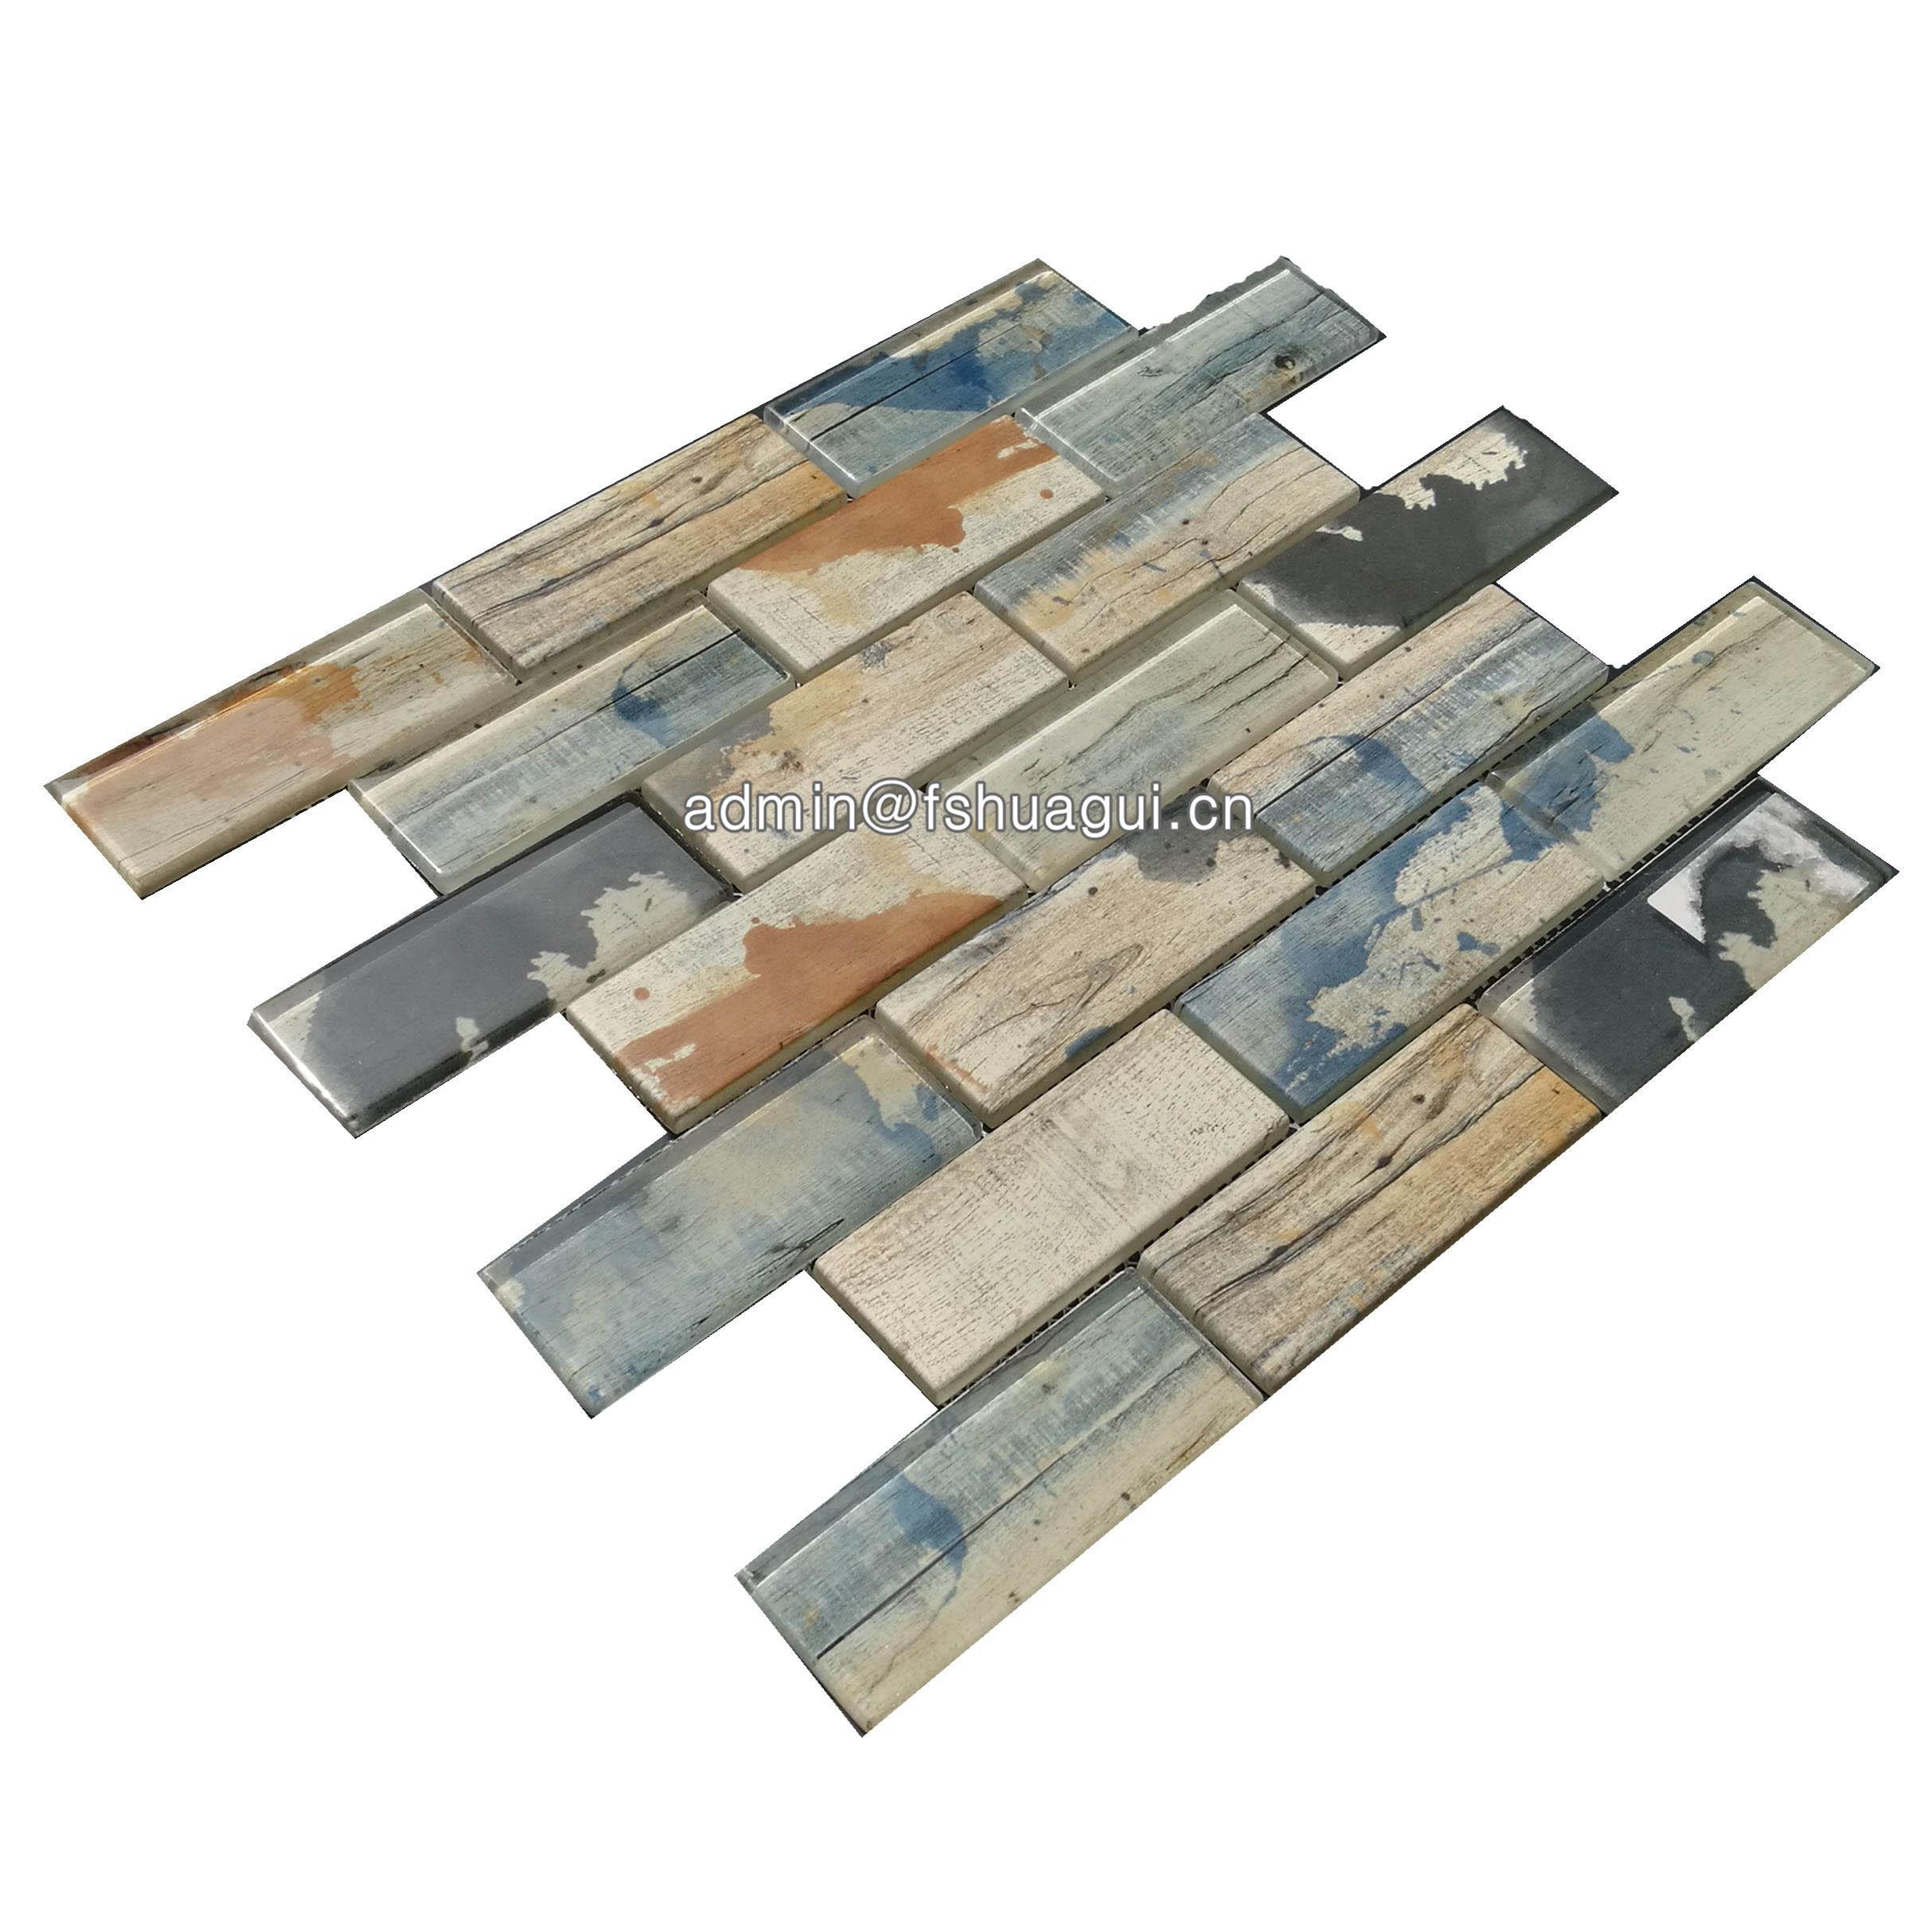 Huagui 2x4 graffiti brick pattern glass tile  HG-WJ409 GLASS MOSAIC TILE image24